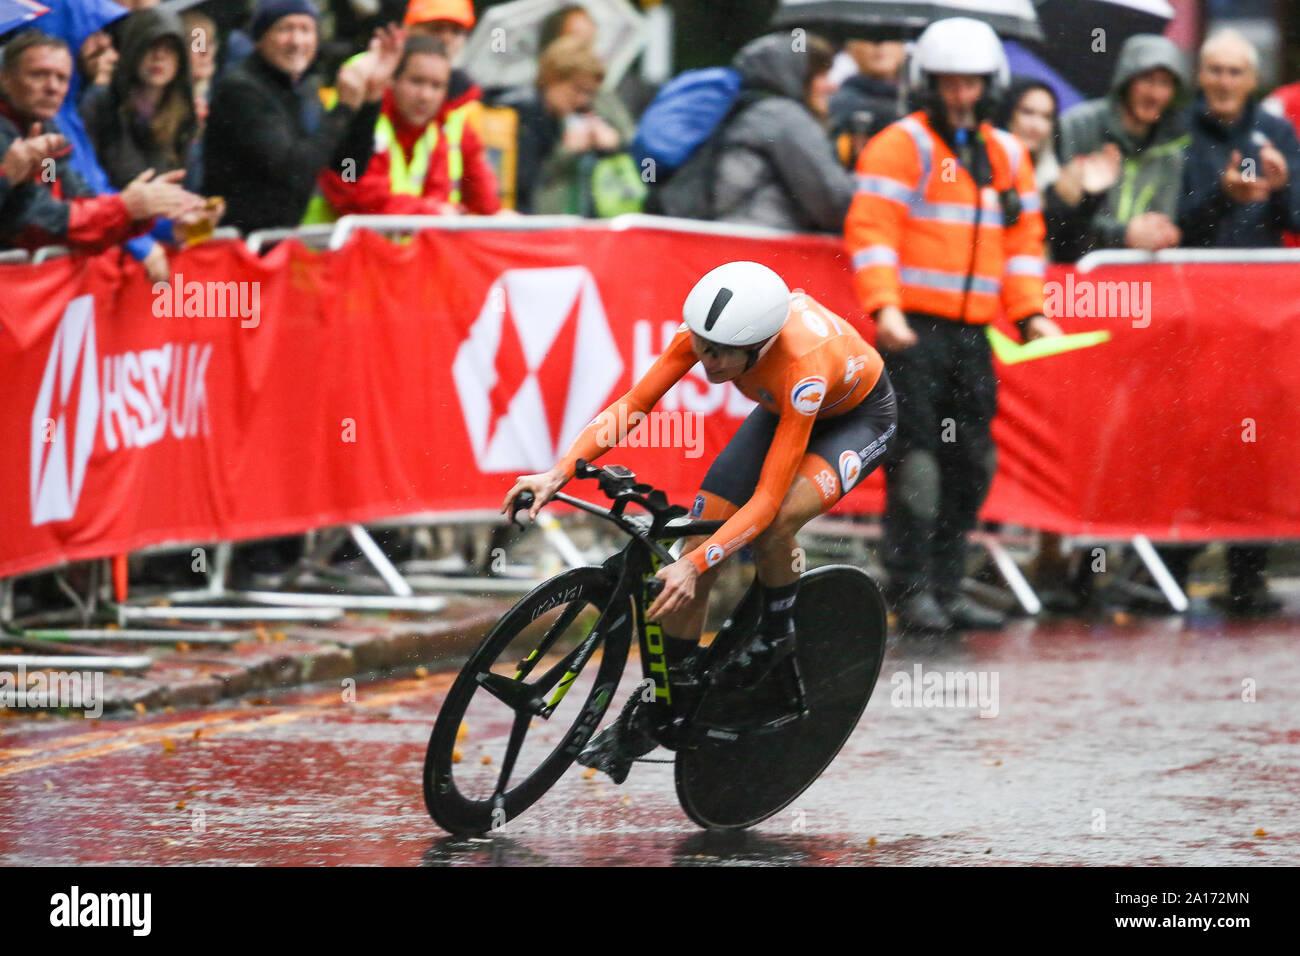 Harrogate, UK. 24th September 2019. Annemiek Van Vleuten   of the Nethlerlands crosses the line to take Bronze in the 2019 UCI Road World Championships Womens Elite Individual Time Trial. September 24, 2019 Credit Dan-Cooke/Alamy Live News Stock Photo